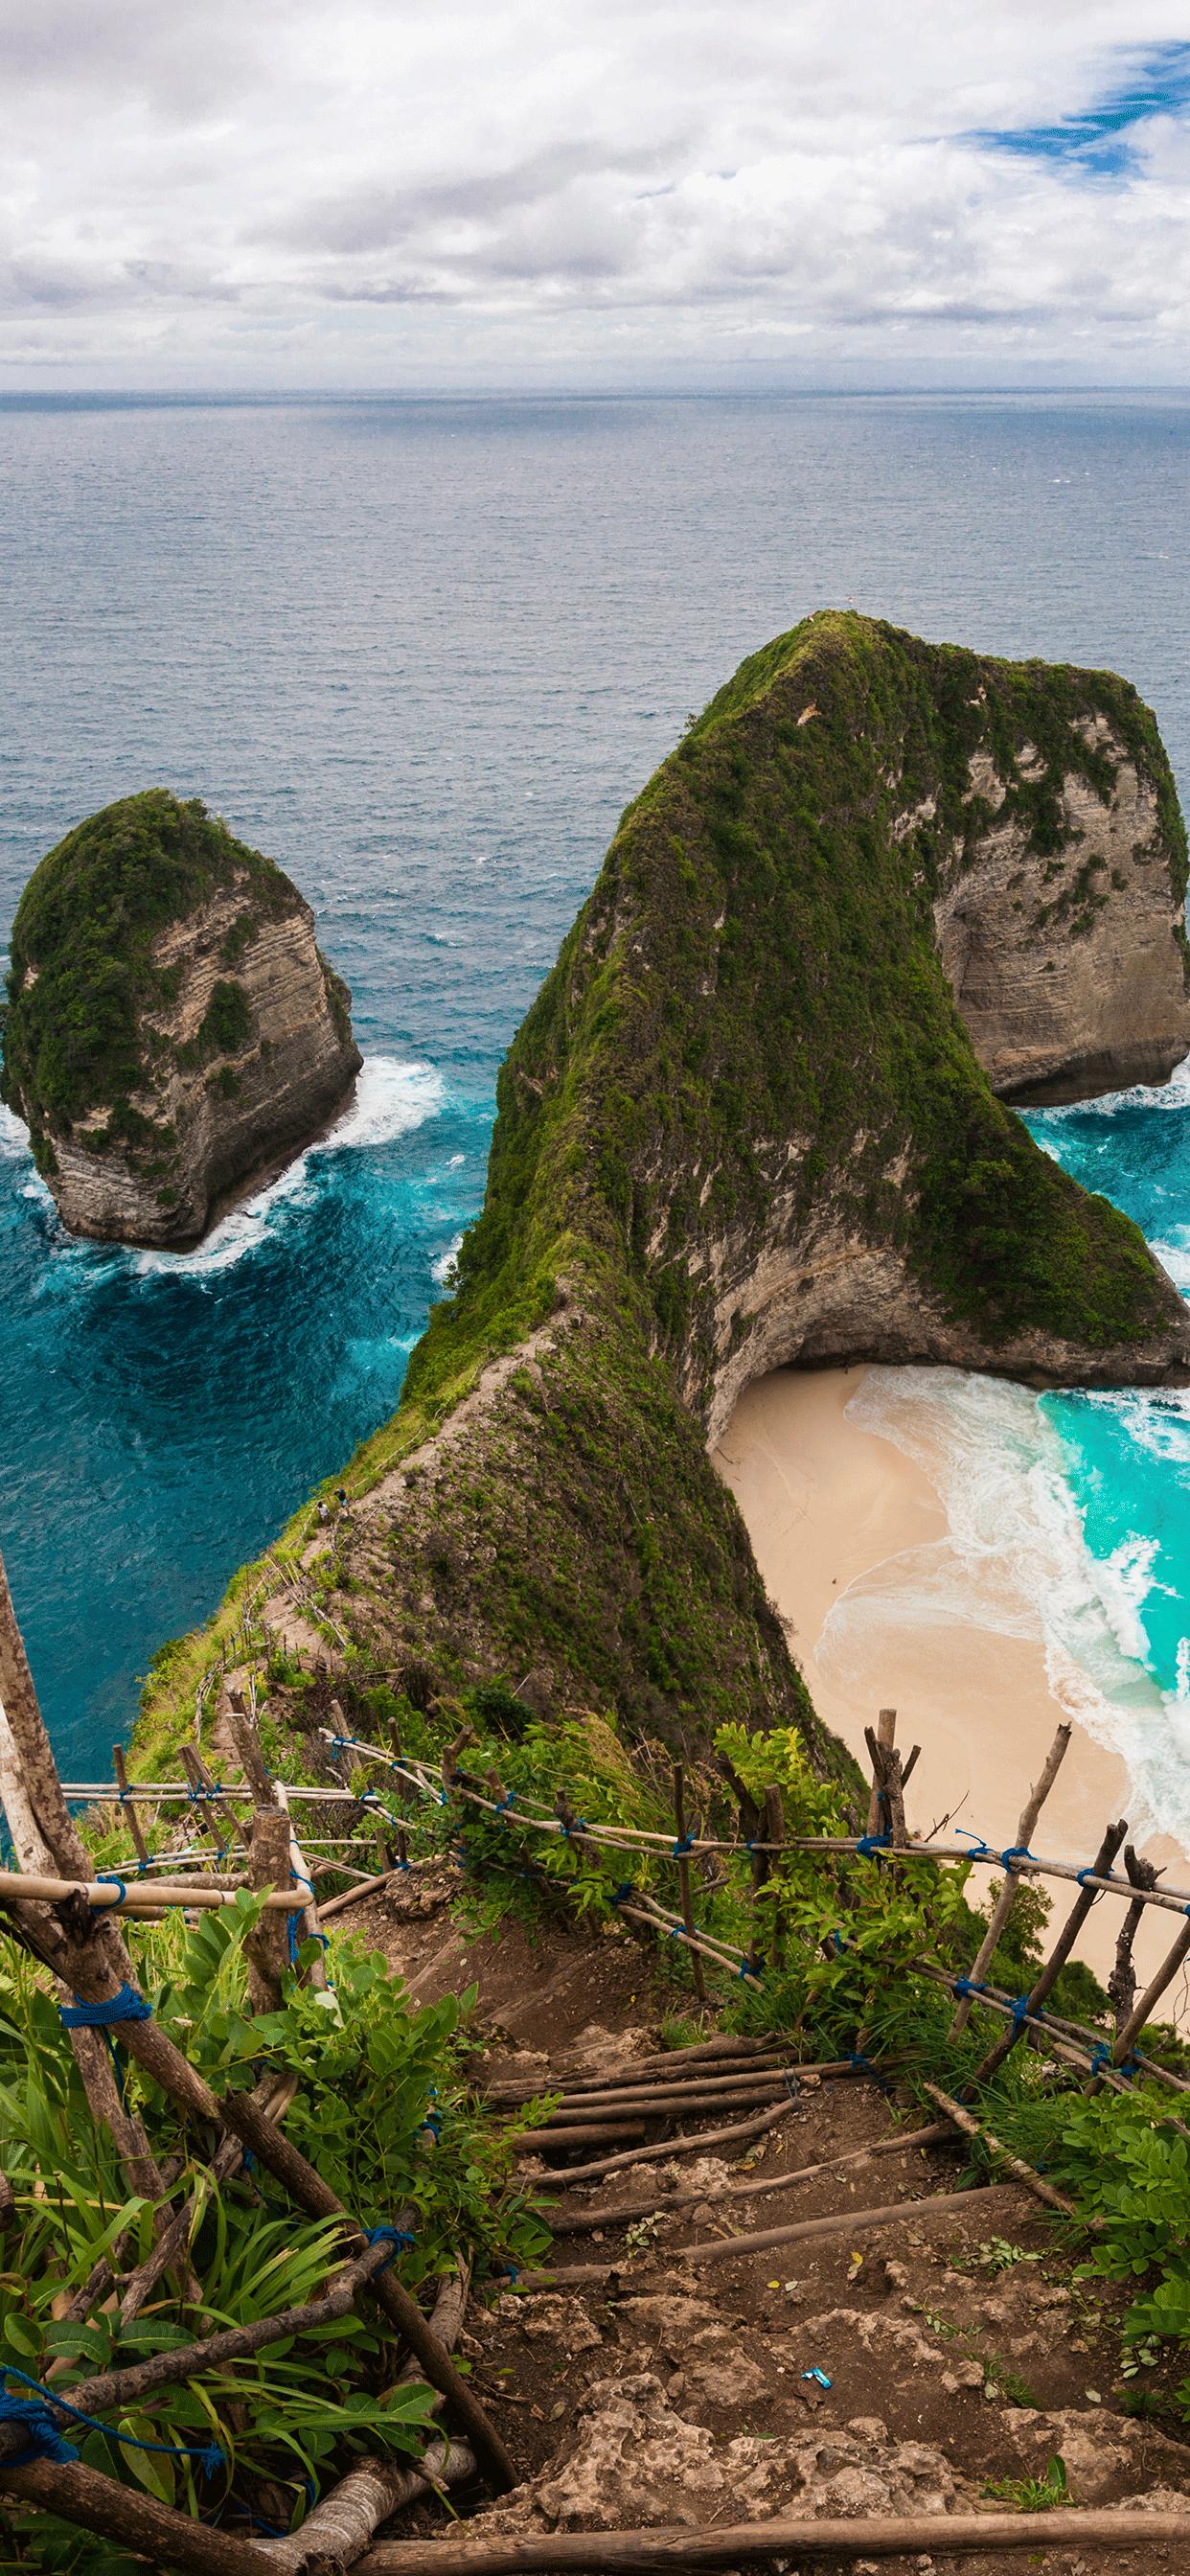 iPhone wallpaper indonesia kelingking beach Fonds d'écran iPhone du 13/02/2019